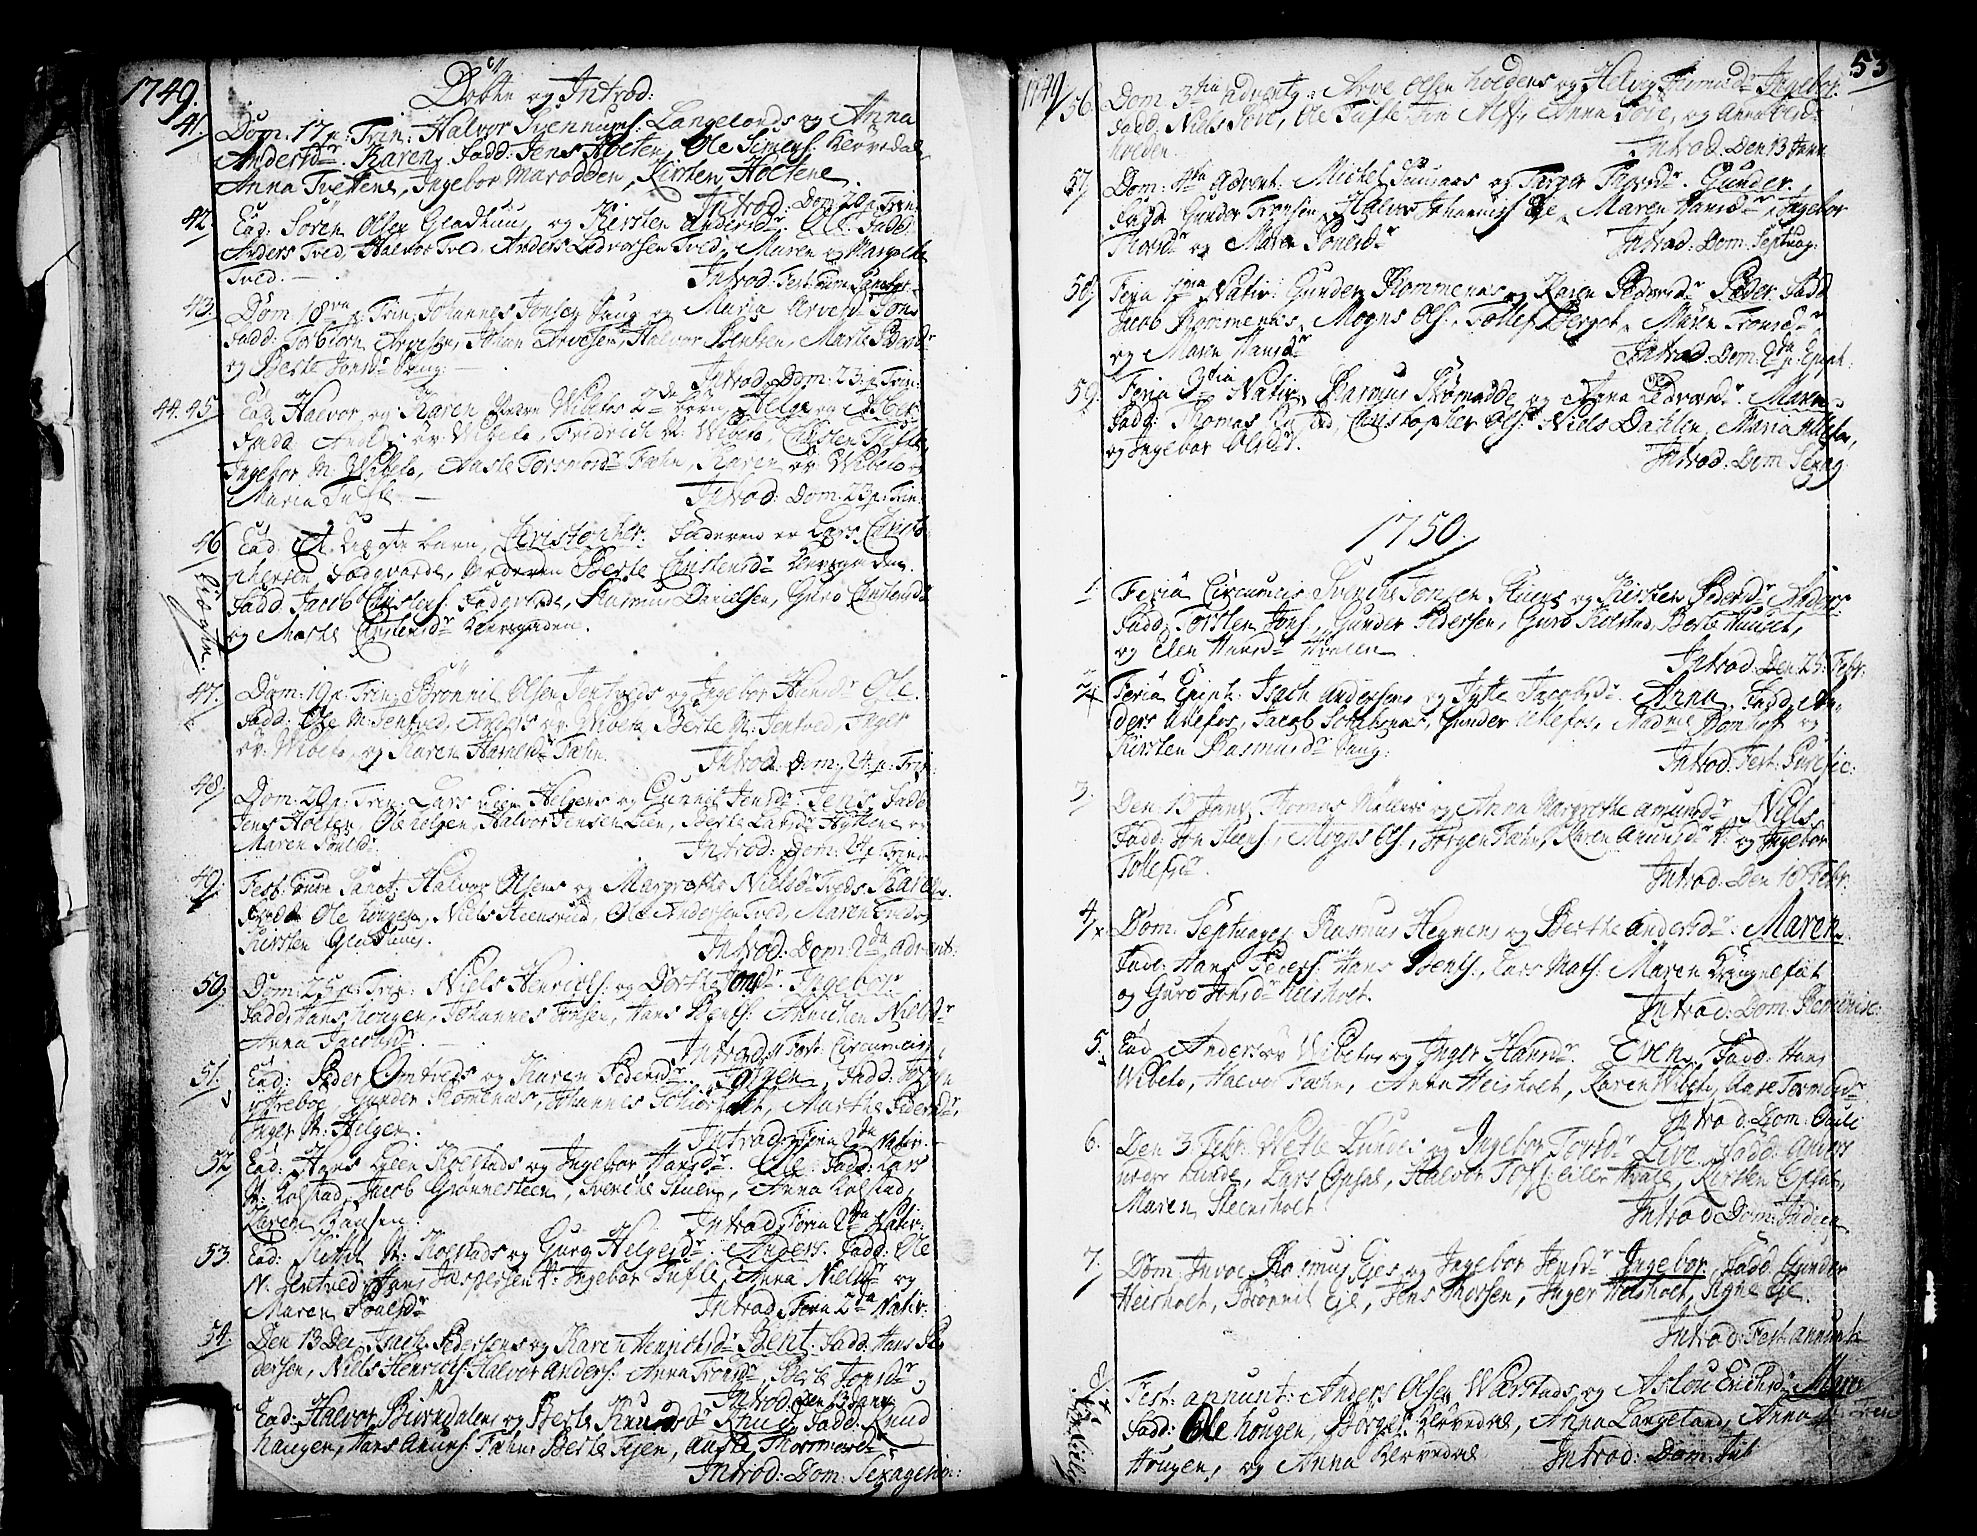 SAKO, Holla kirkebøker, F/Fa/L0001: Ministerialbok nr. 1, 1717-1779, s. 53